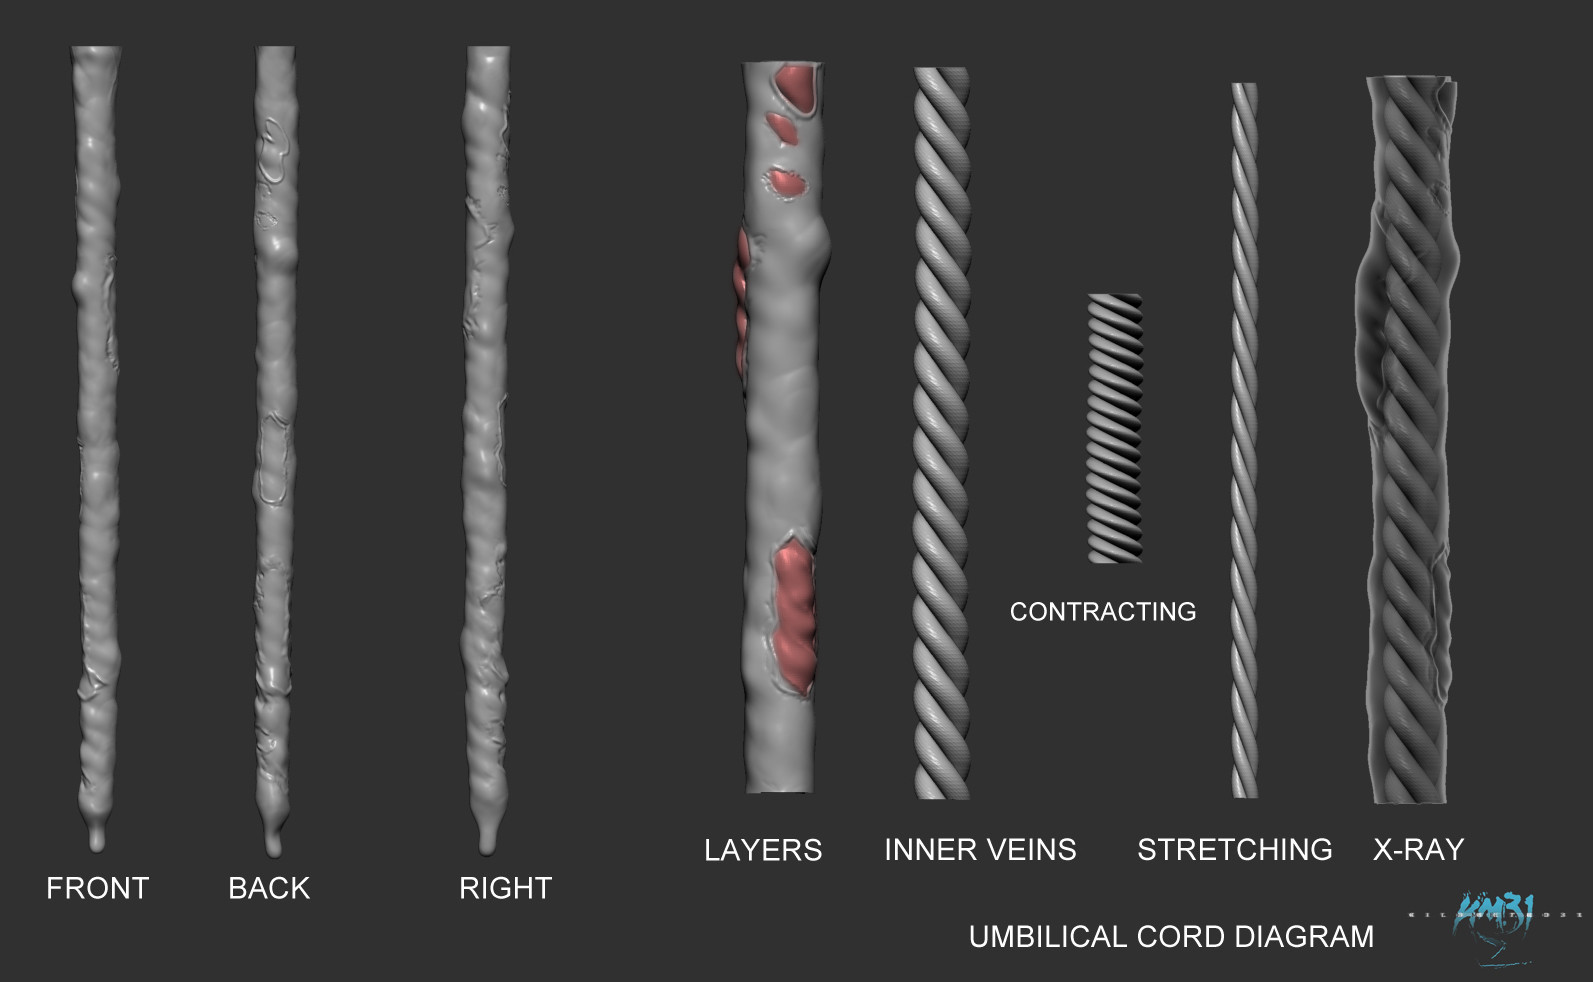 Raul eduardo sanchez osorio raul eduardo sanchez osorio km31 2 umbilical cord diagram 001